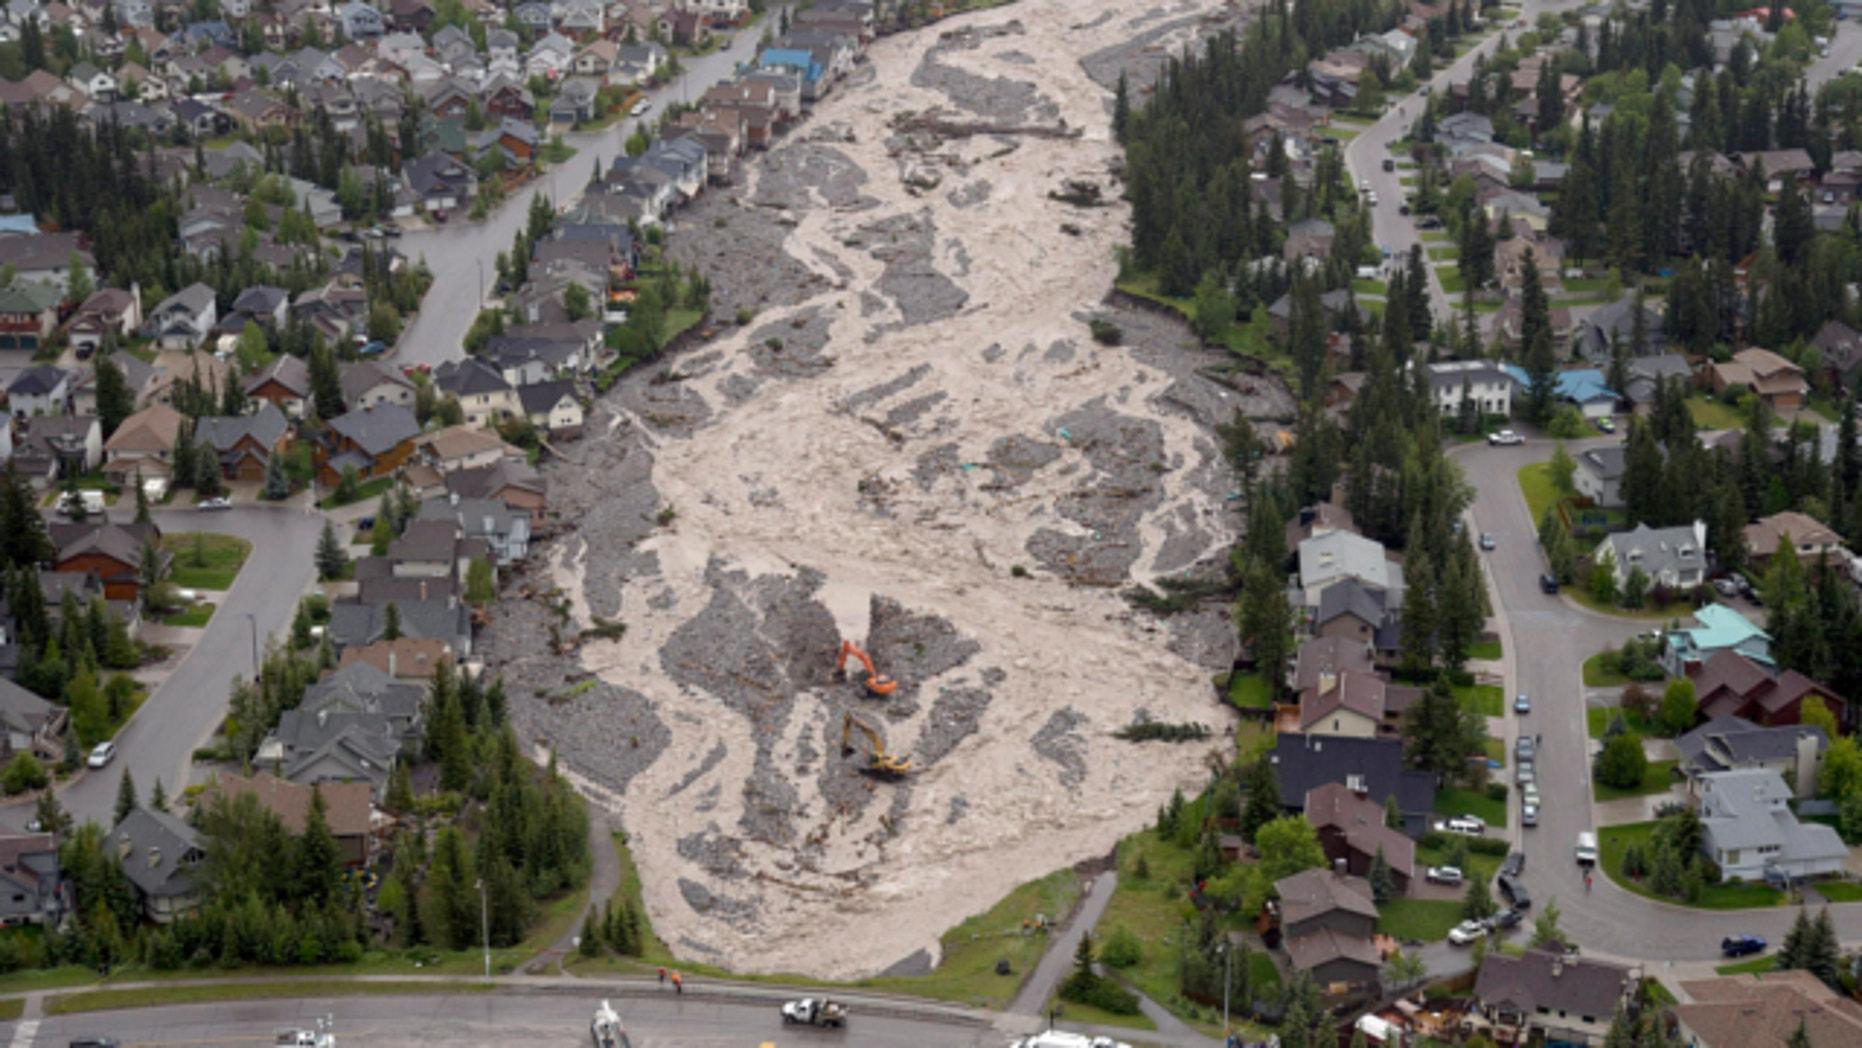 June 21, 2013: The flooded Cougar Creek runs through Canmore, Alberta.